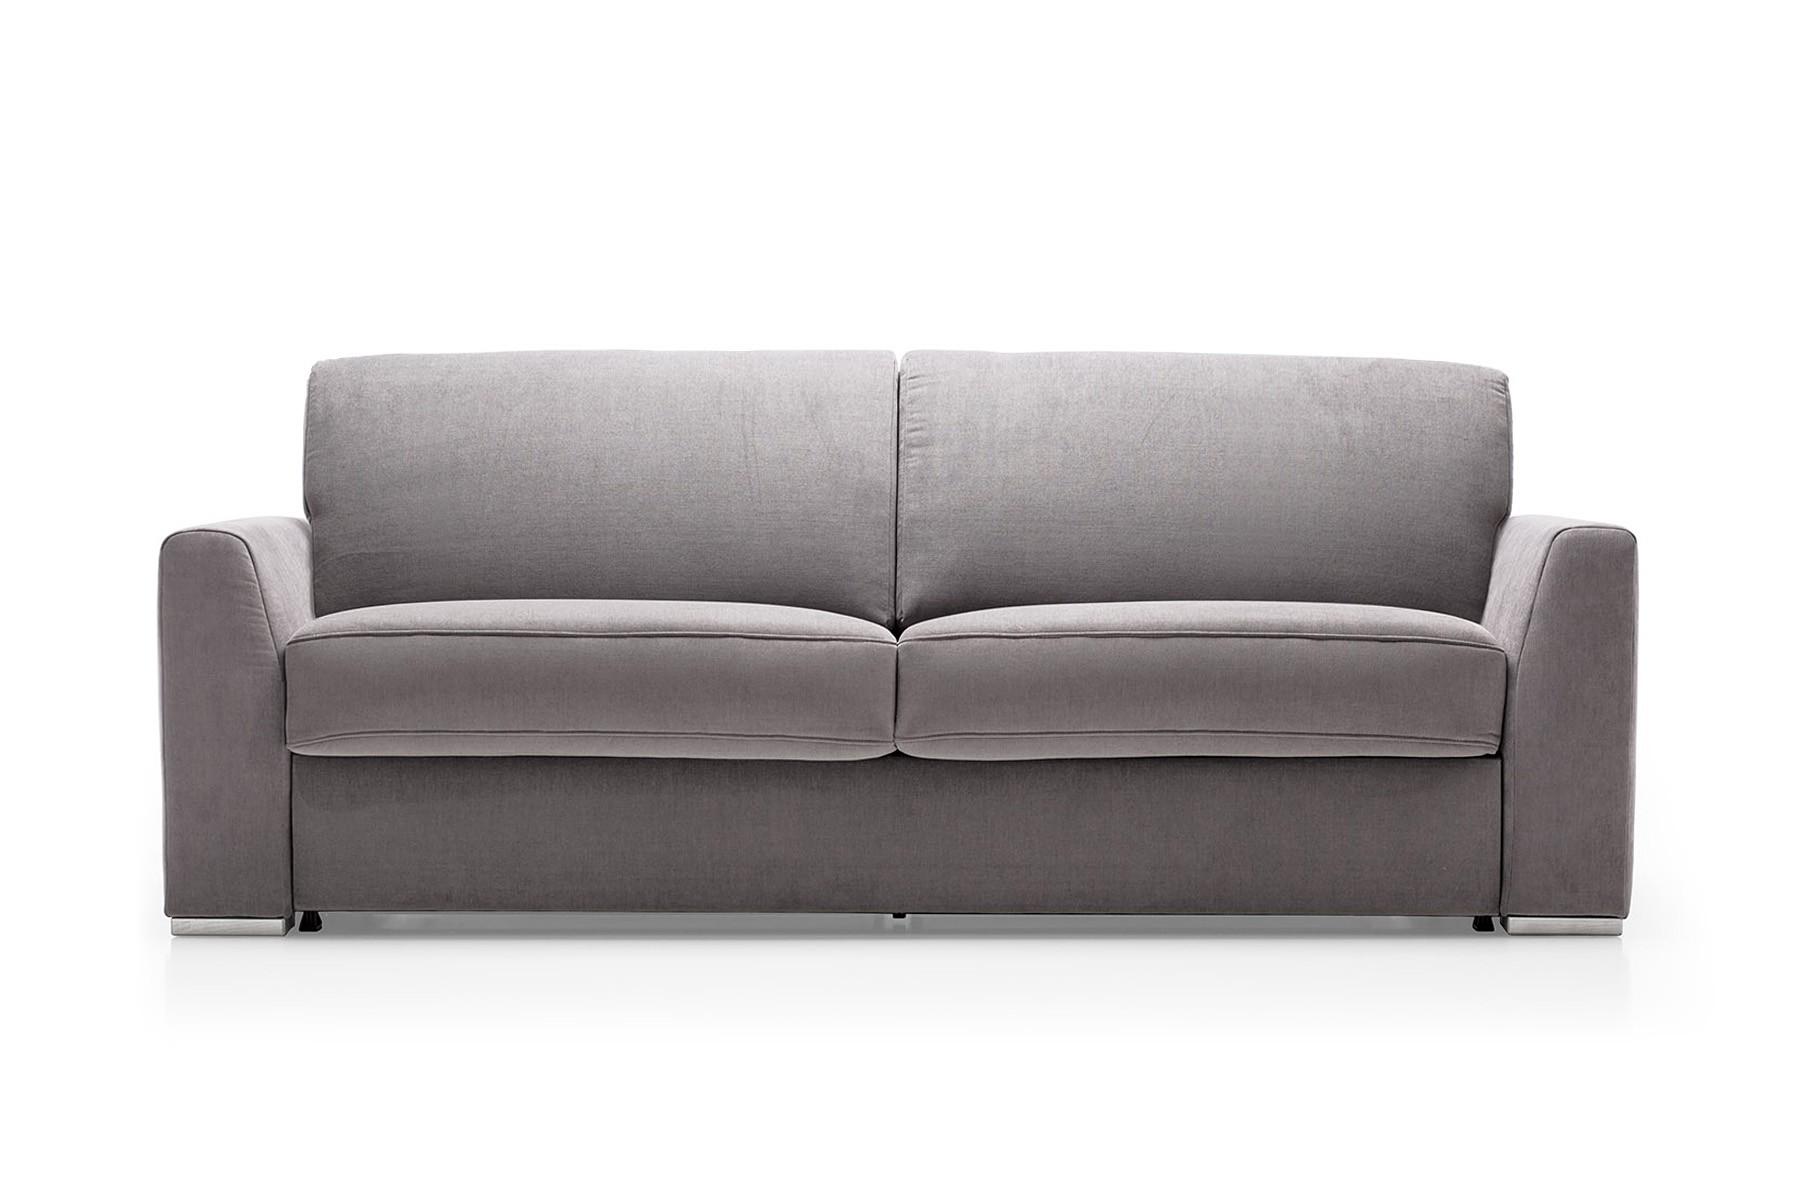 Full Size of Sofa 3 Sitzer Grau Couch Samt 3 Sitzer Nino Schwarz/grau Louisiana (3 Sitzer Mit Polster Grau) Retro Kingsley Ikea 2 Und Schlaffunktion Rattan Leder Reposa Sofa Sofa 3 Sitzer Grau